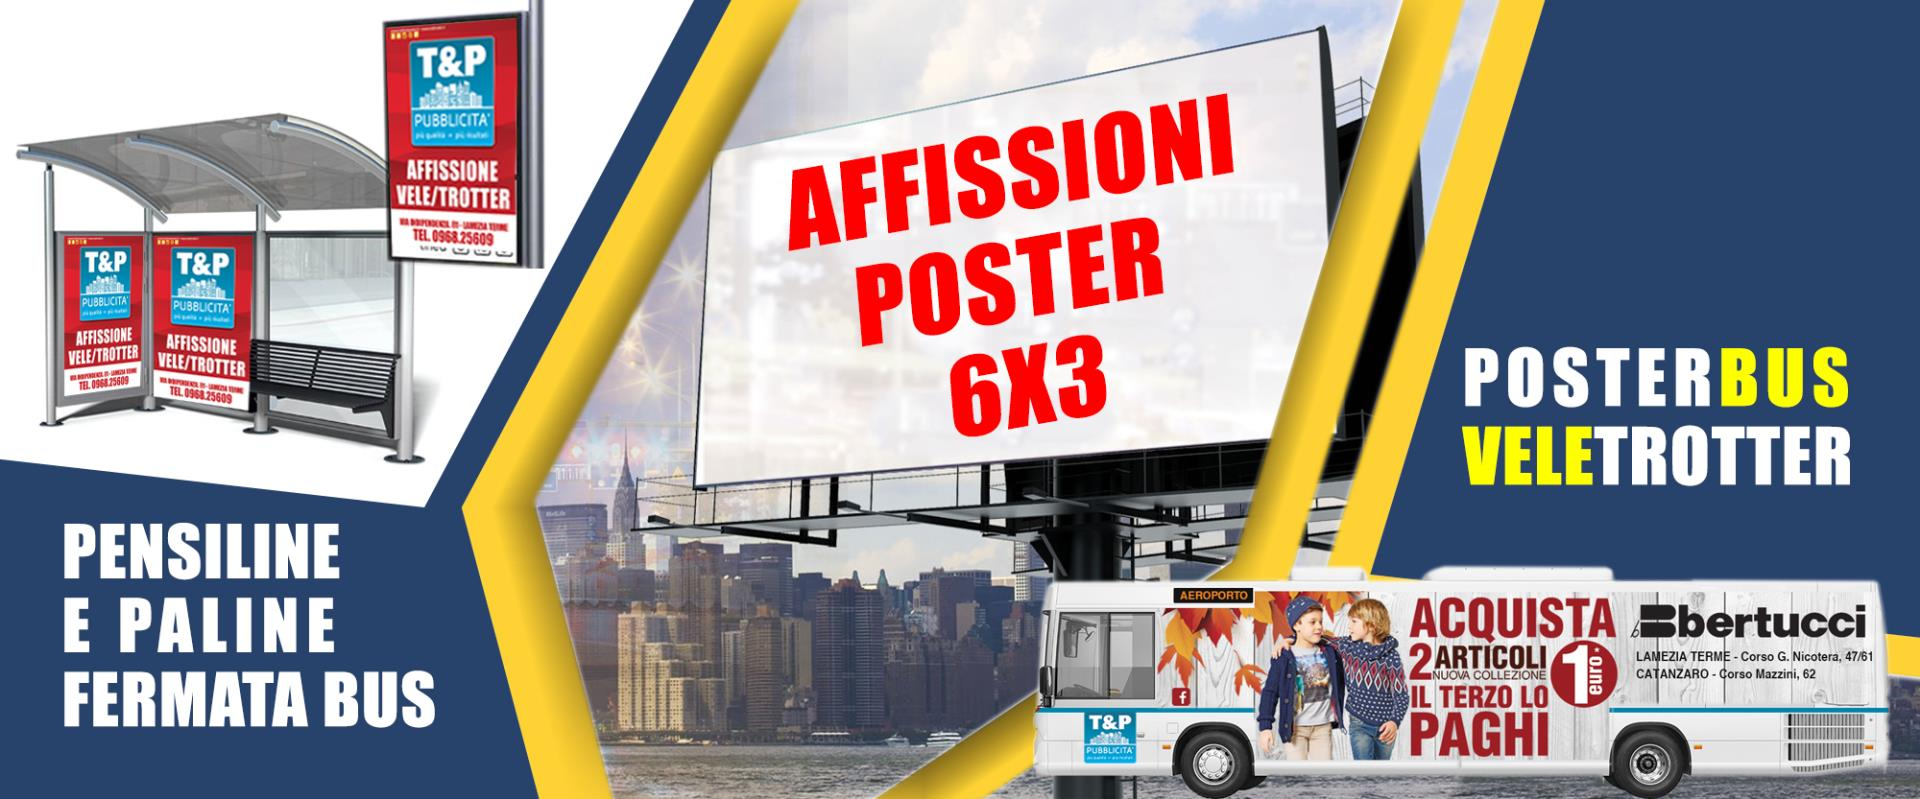 affissioni poster catanzaro